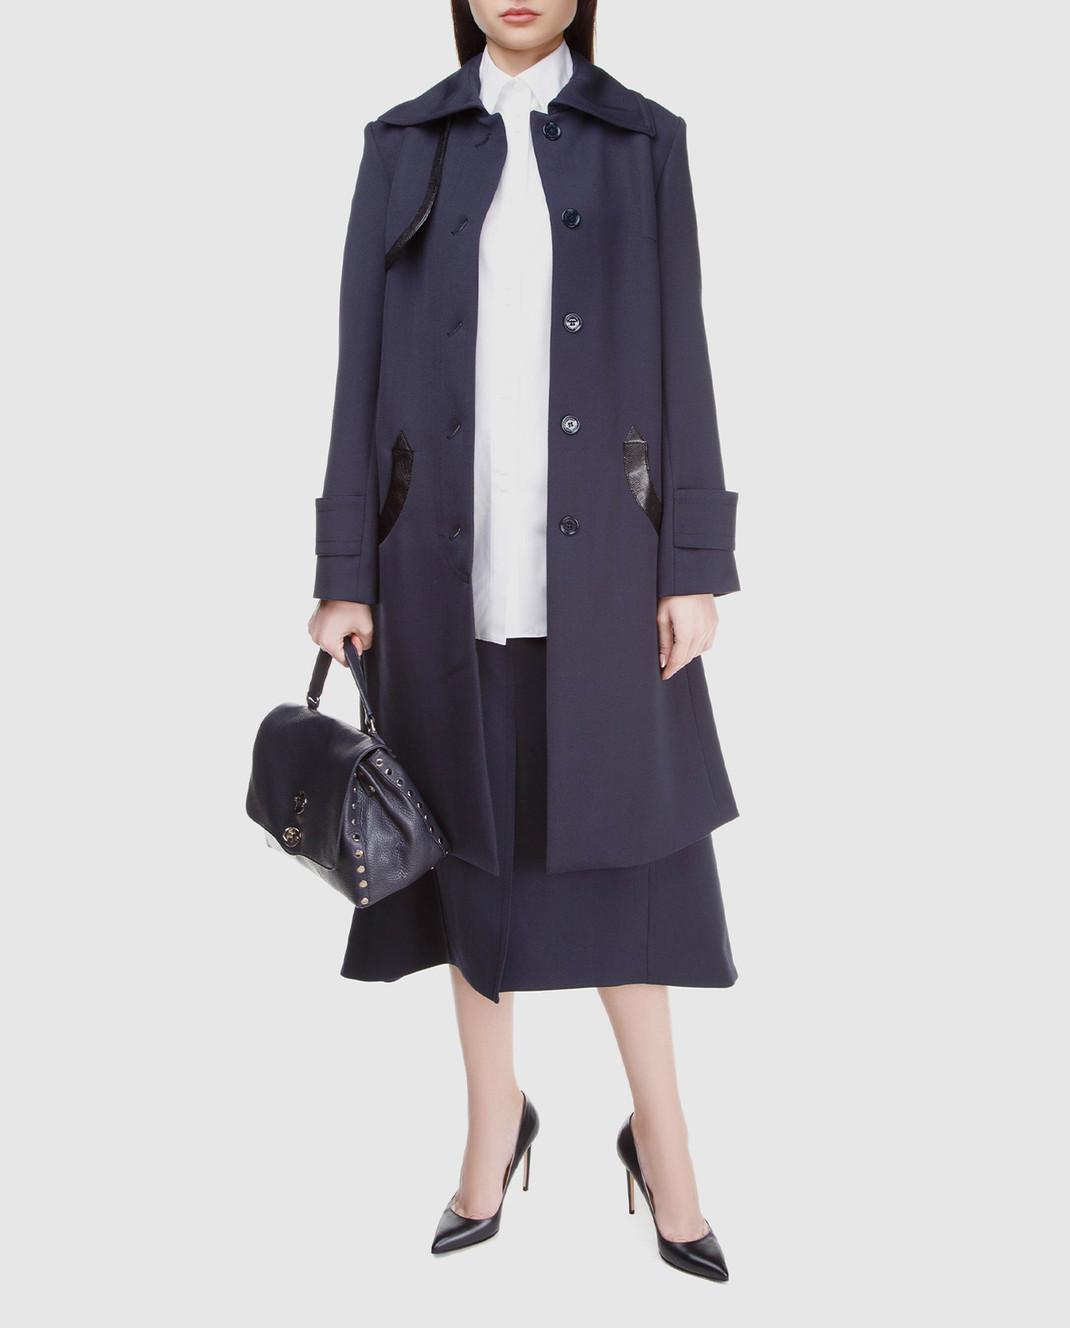 NINA RICCI Темно-синее пальто из шерсти 17HCMA016WV0220 изображение 2